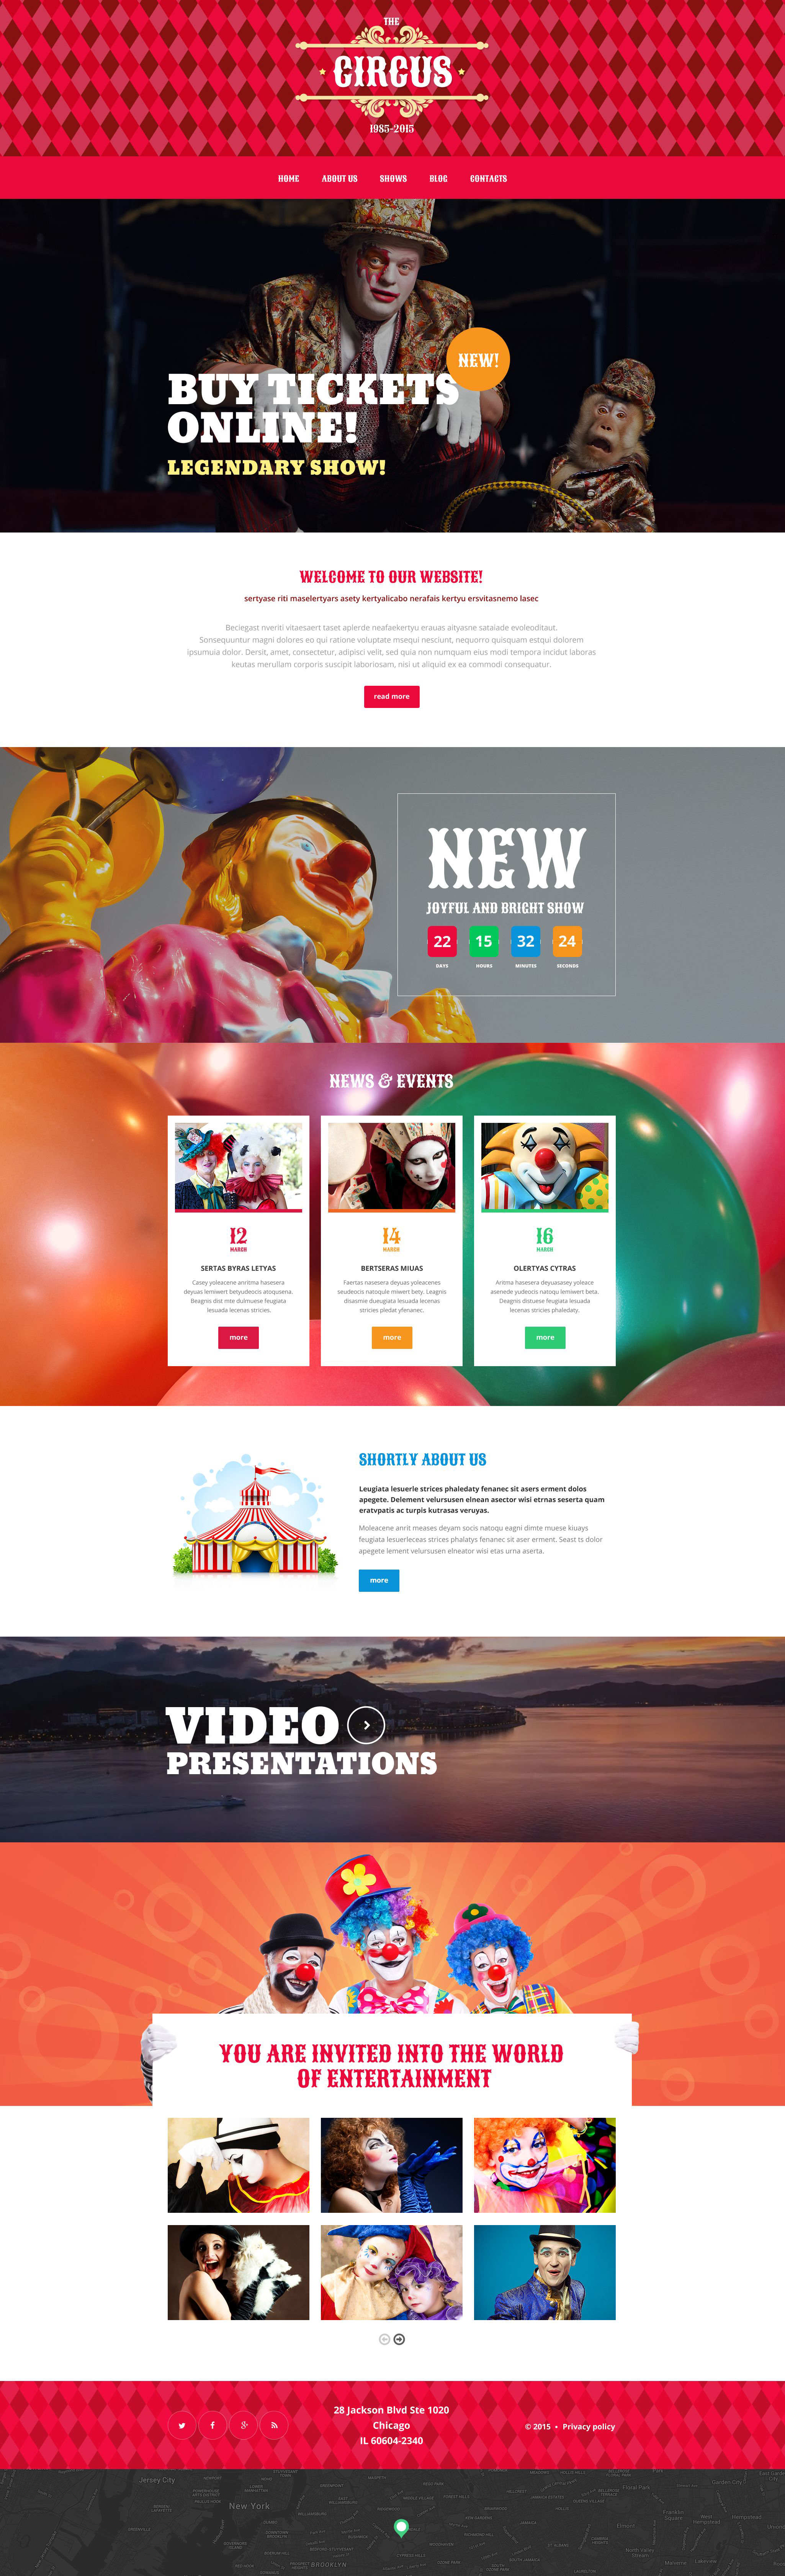 Responsive Circus Tent Wordpress #55589